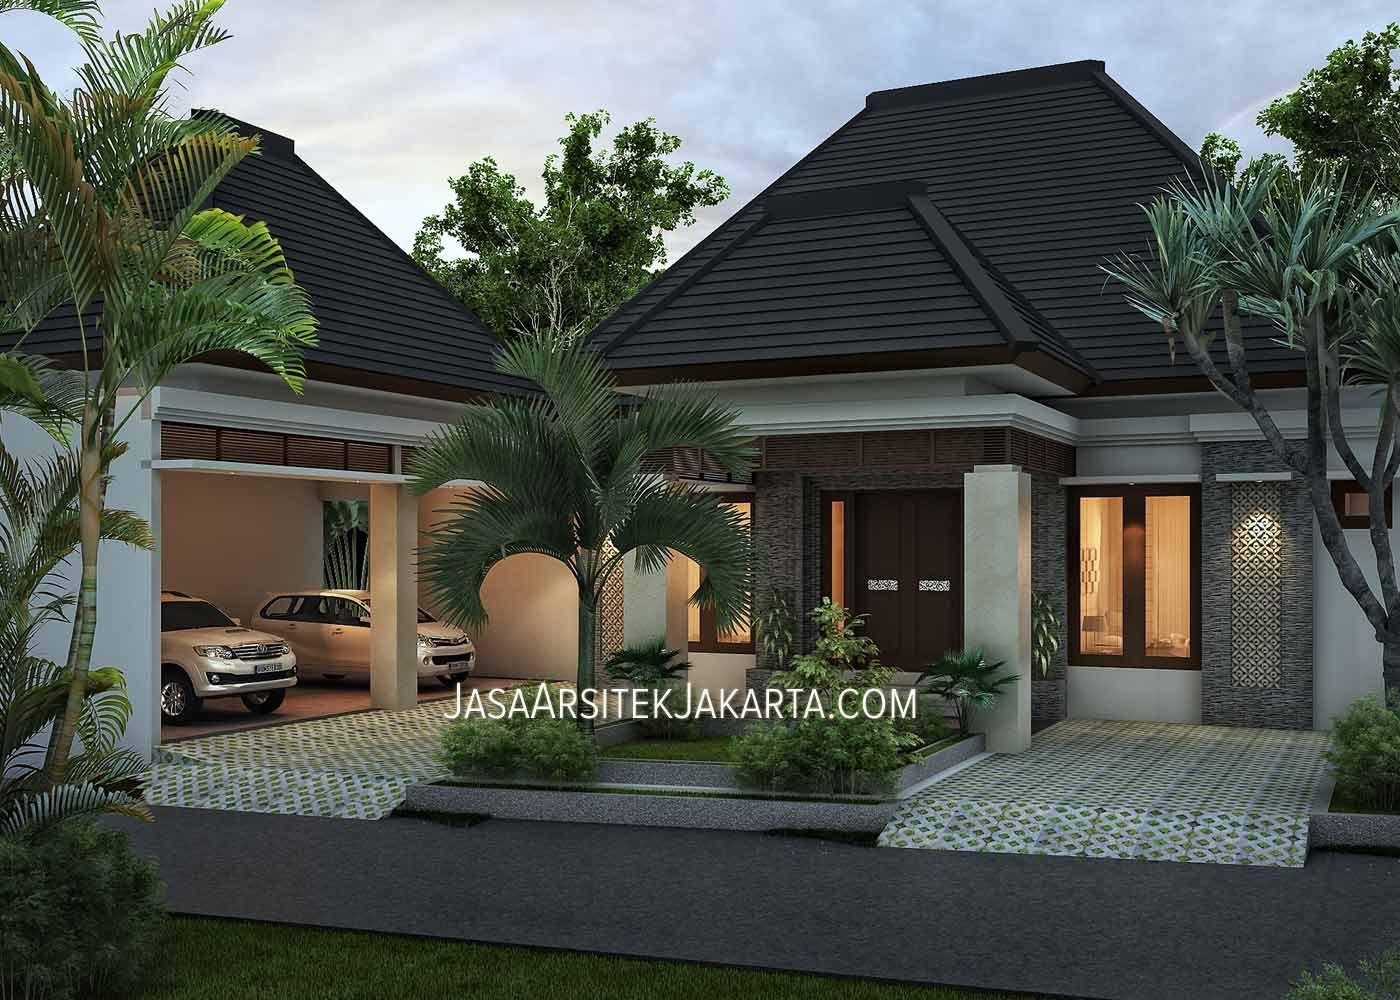 Desain Rumah 4 kamar Luas 330 m2 | Home fashion, Desain